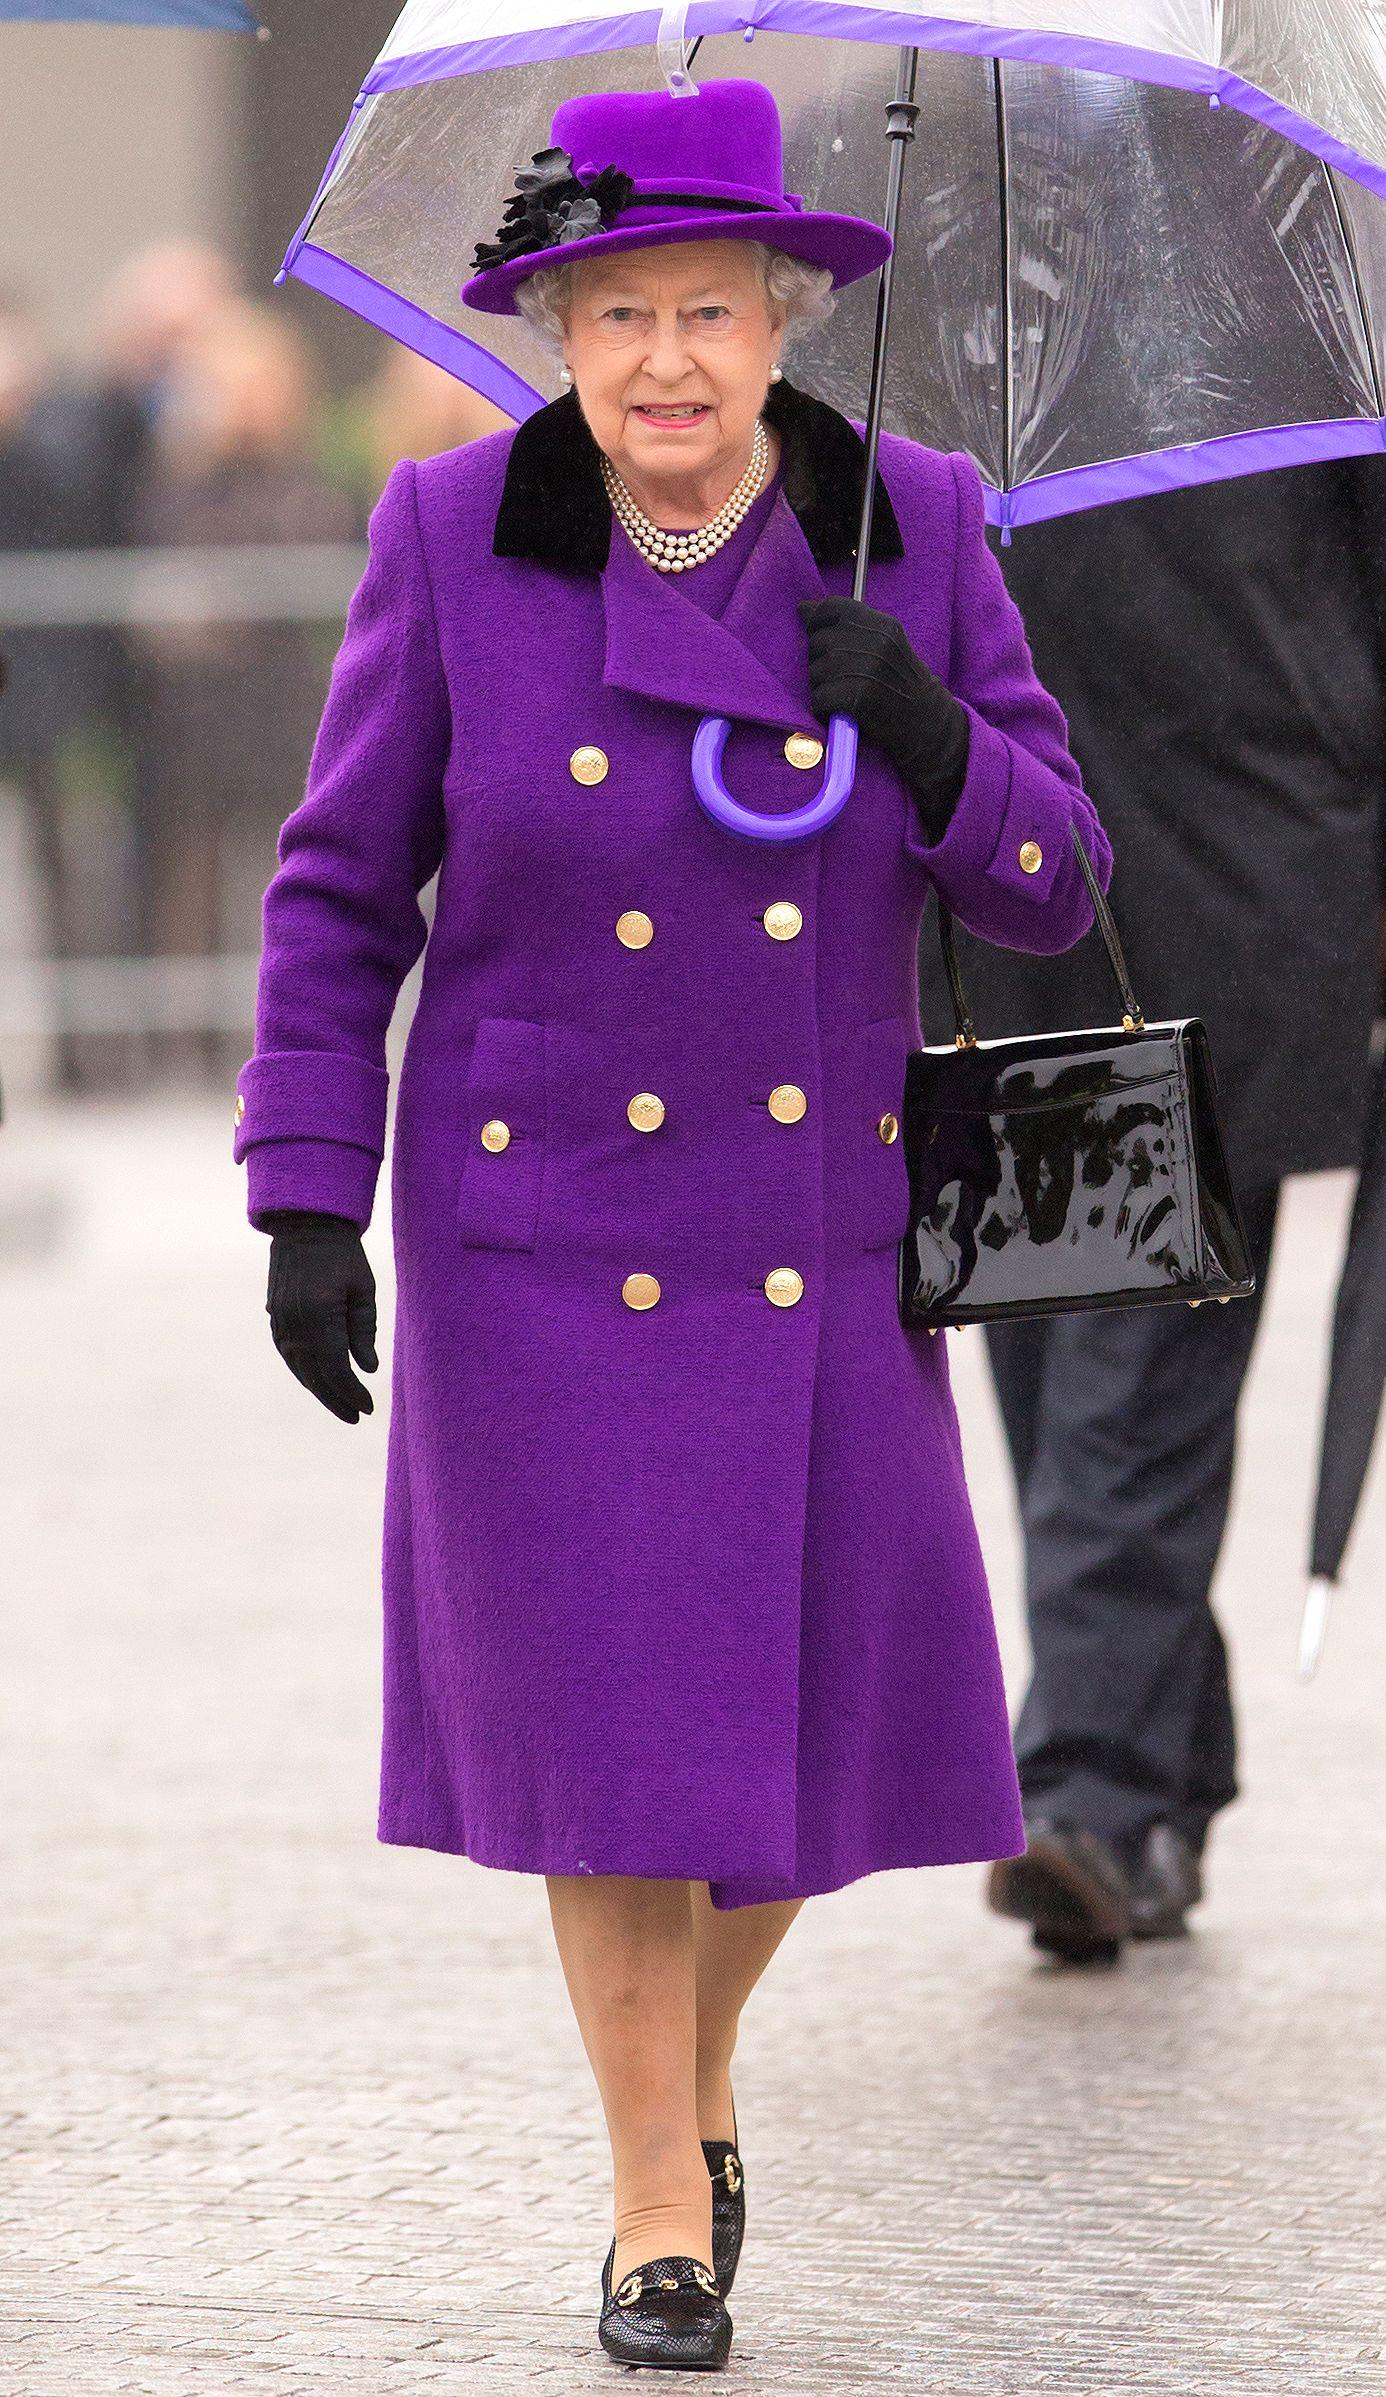 How Queen Elizabeth S Spectrum Of Rainbow Of Coat Dresses Acts Like A Mood Ring Queen Elizabeth Fab Clothing Coat Dress [ 2397 x 1386 Pixel ]